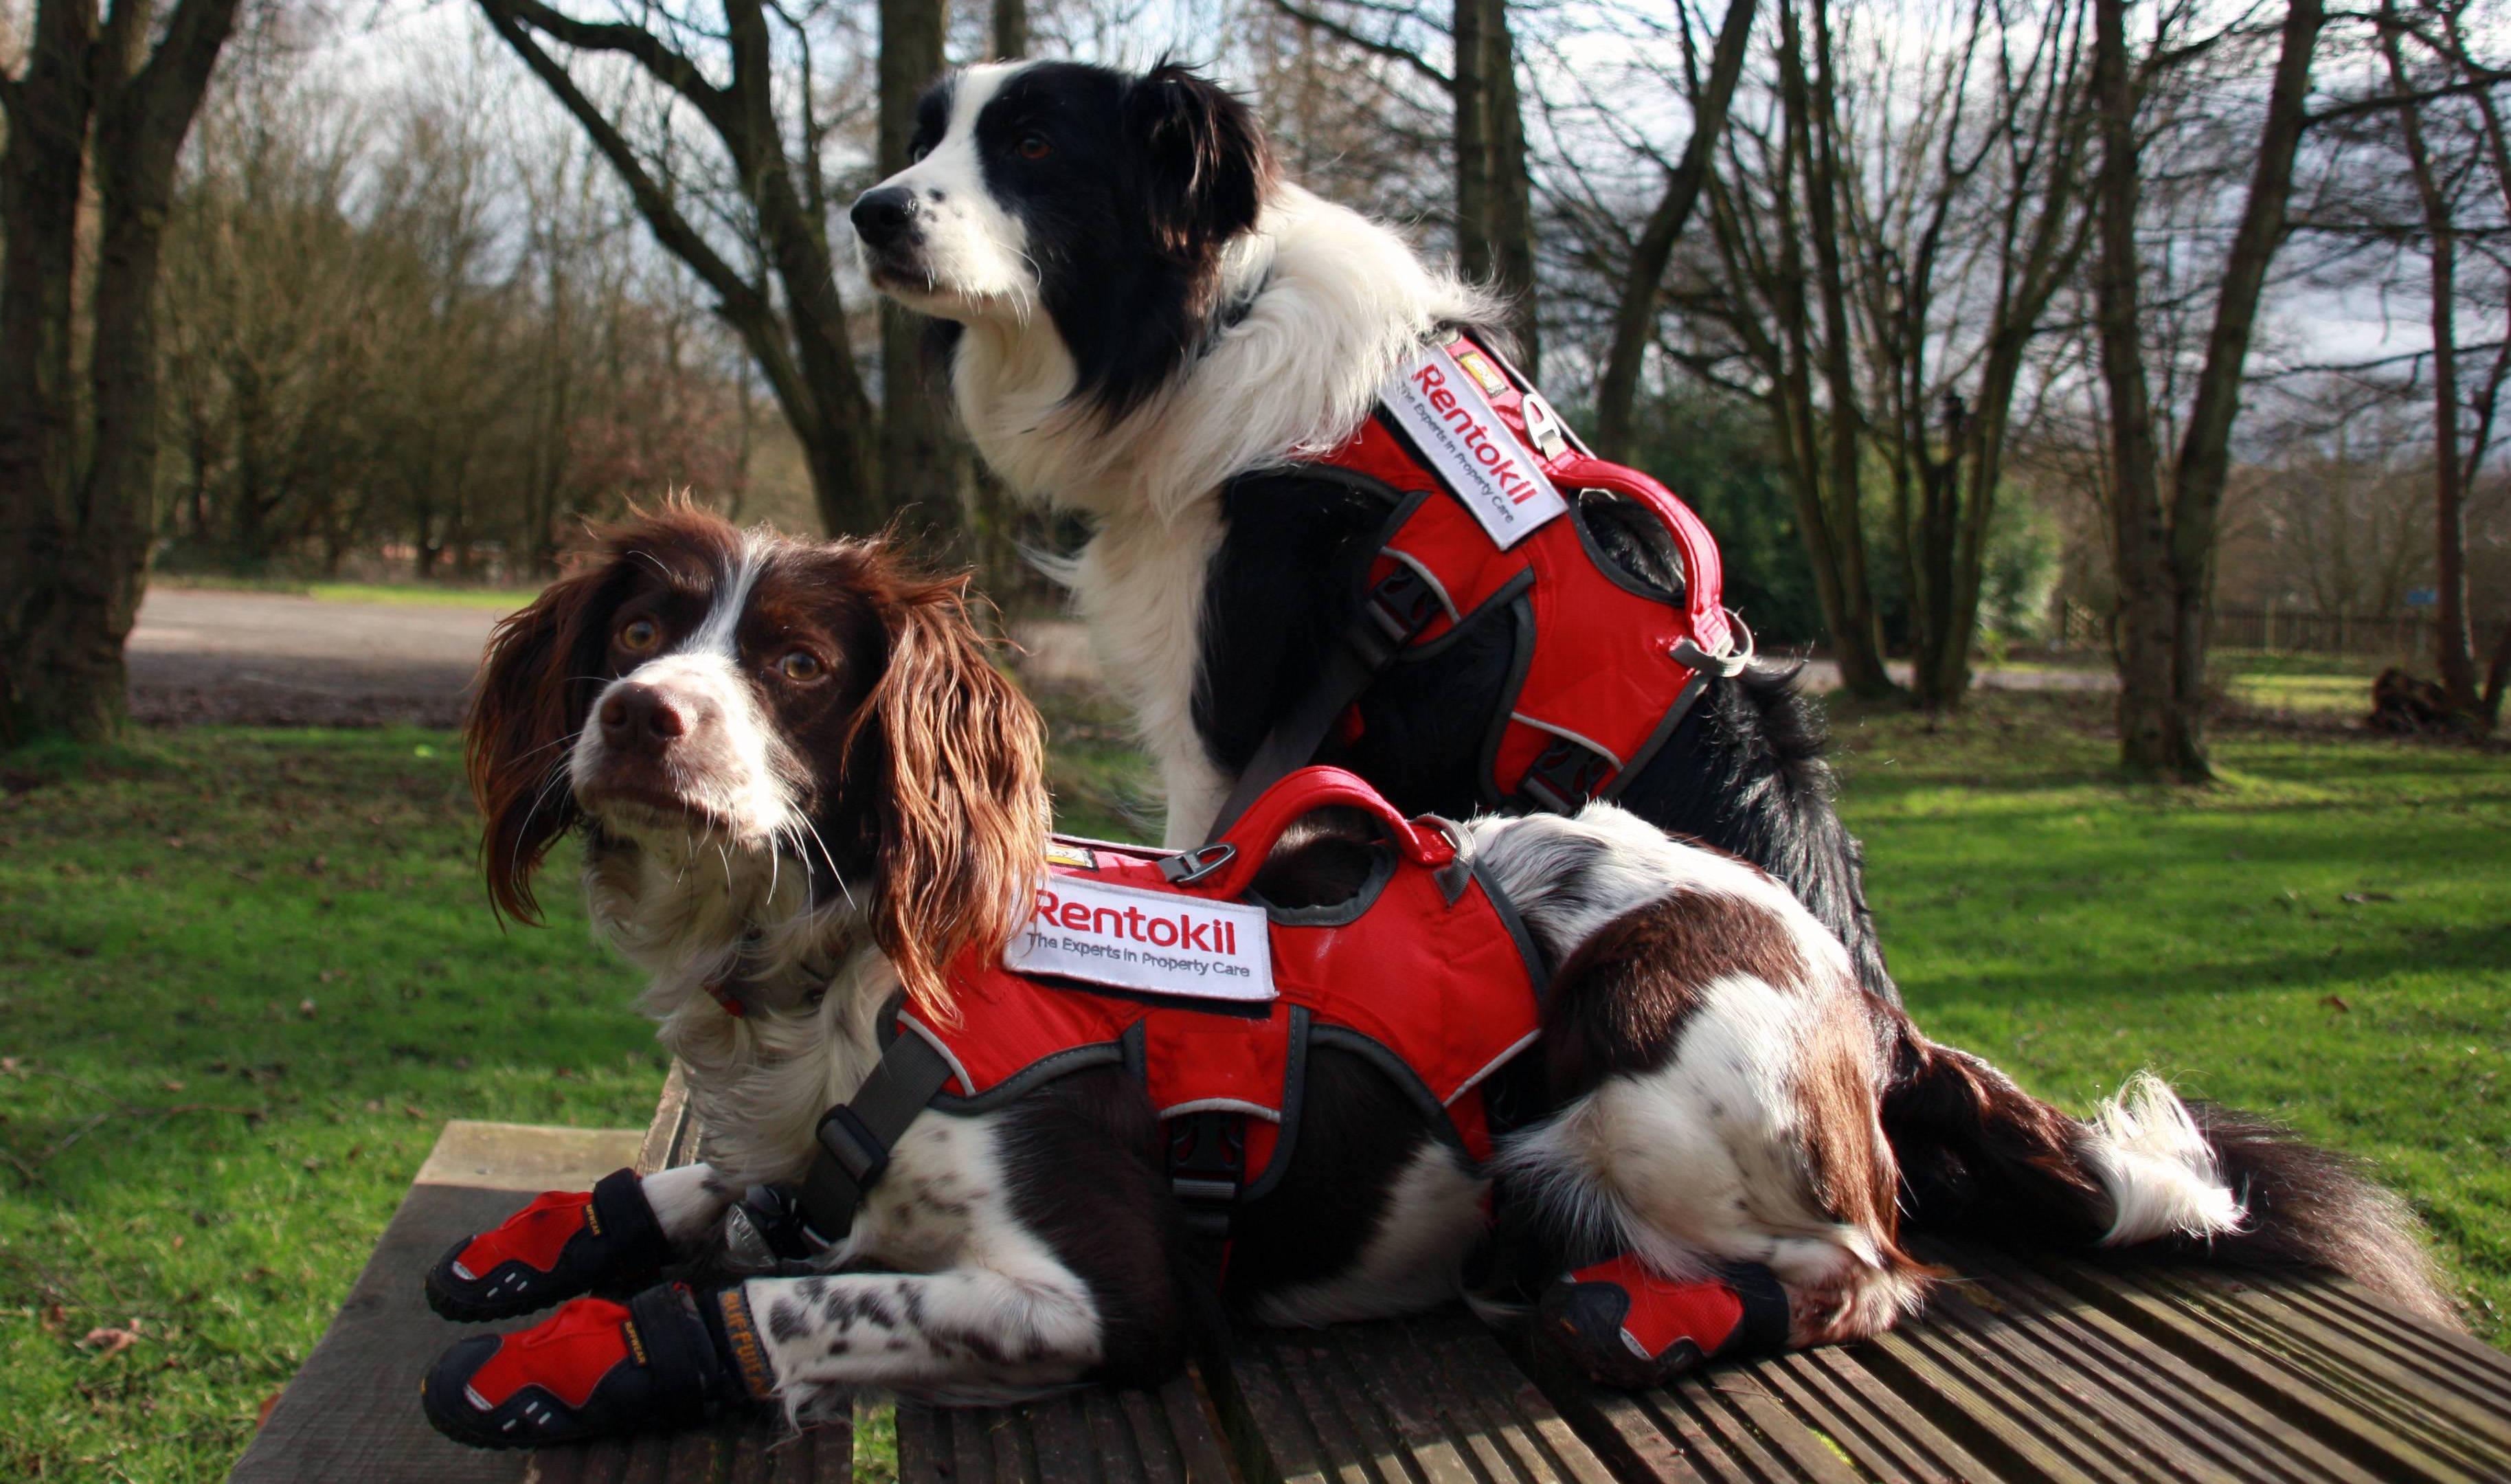 M-and-J-Rentokil-1-Enviro-dogs-Meg-and-Jess